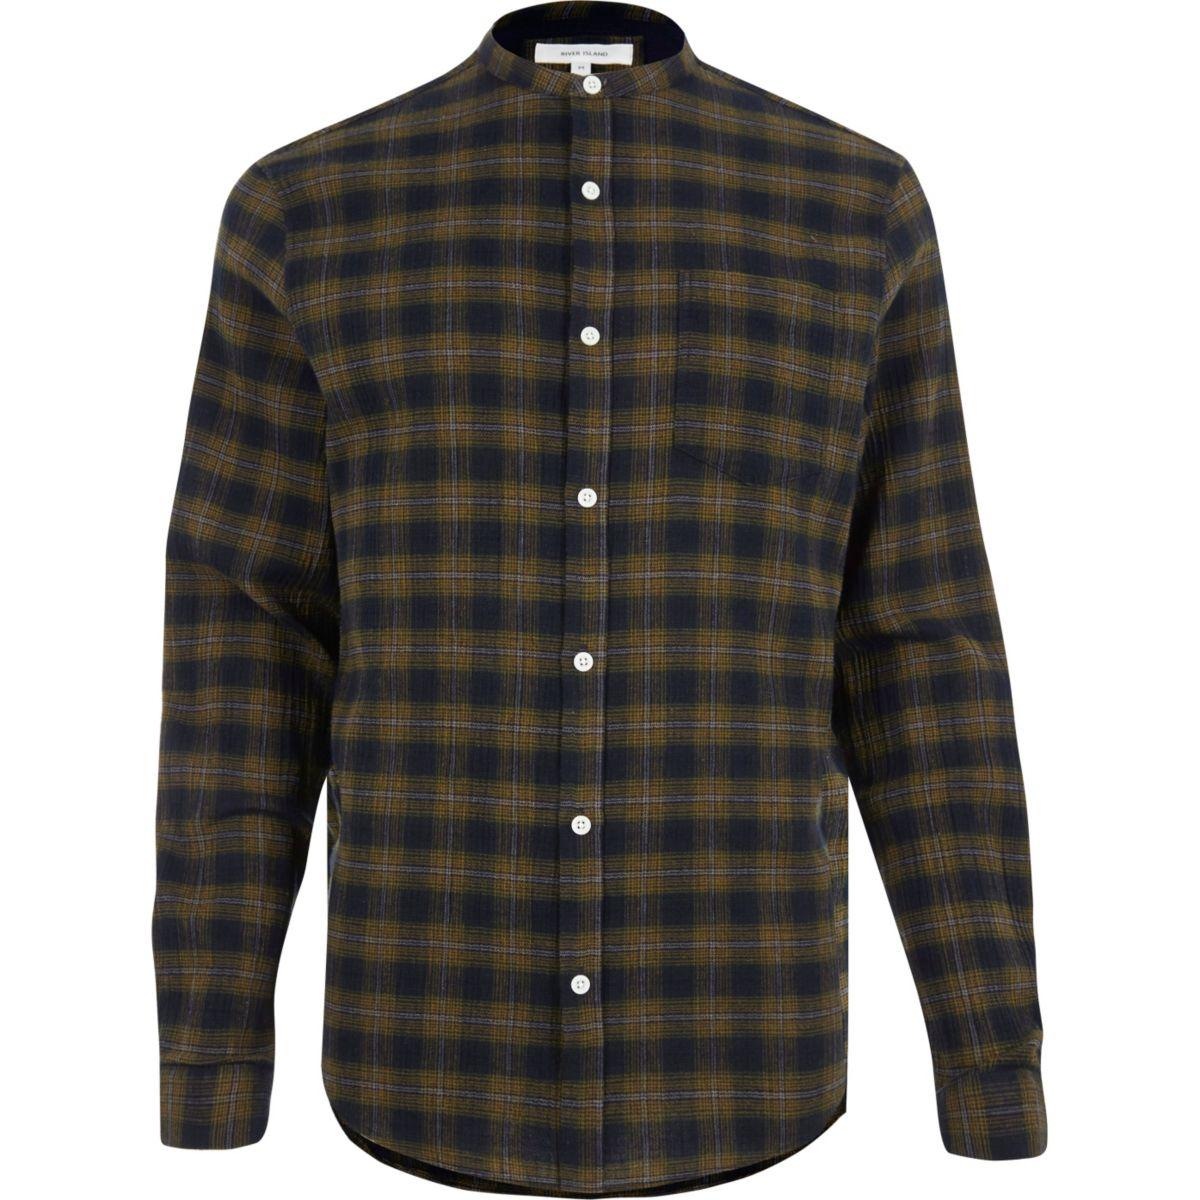 Green check grandad shirt